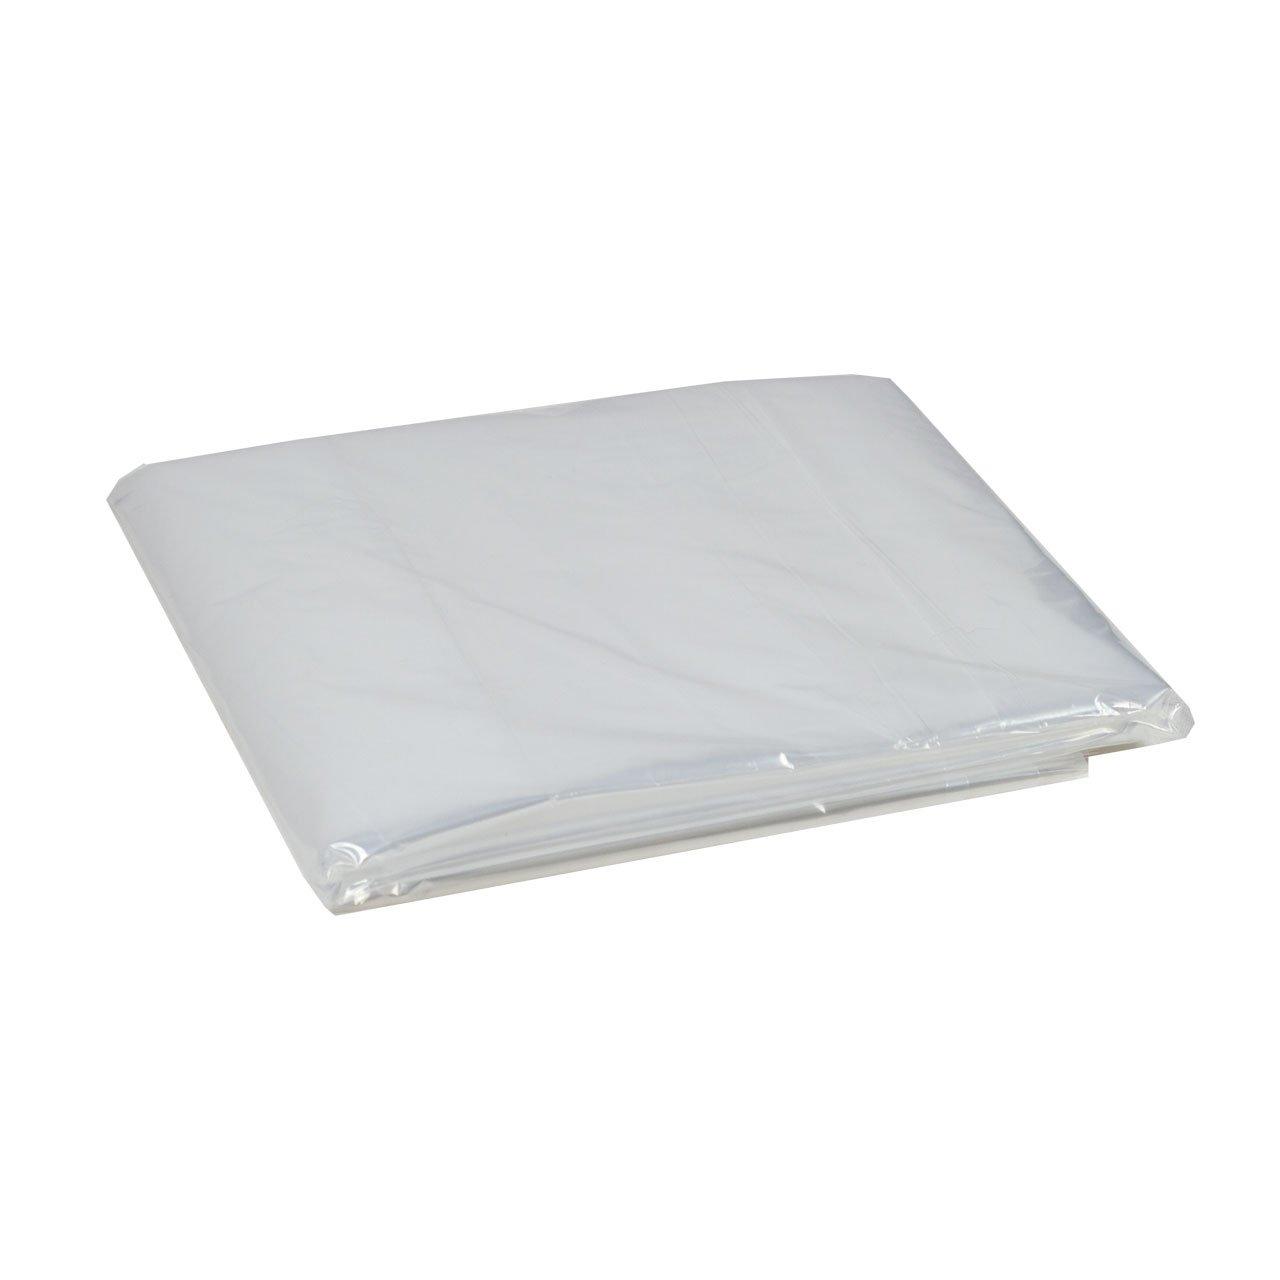 Rayen 6010 - Plástico protector, 360 x 220 cm - [Pack de 3]